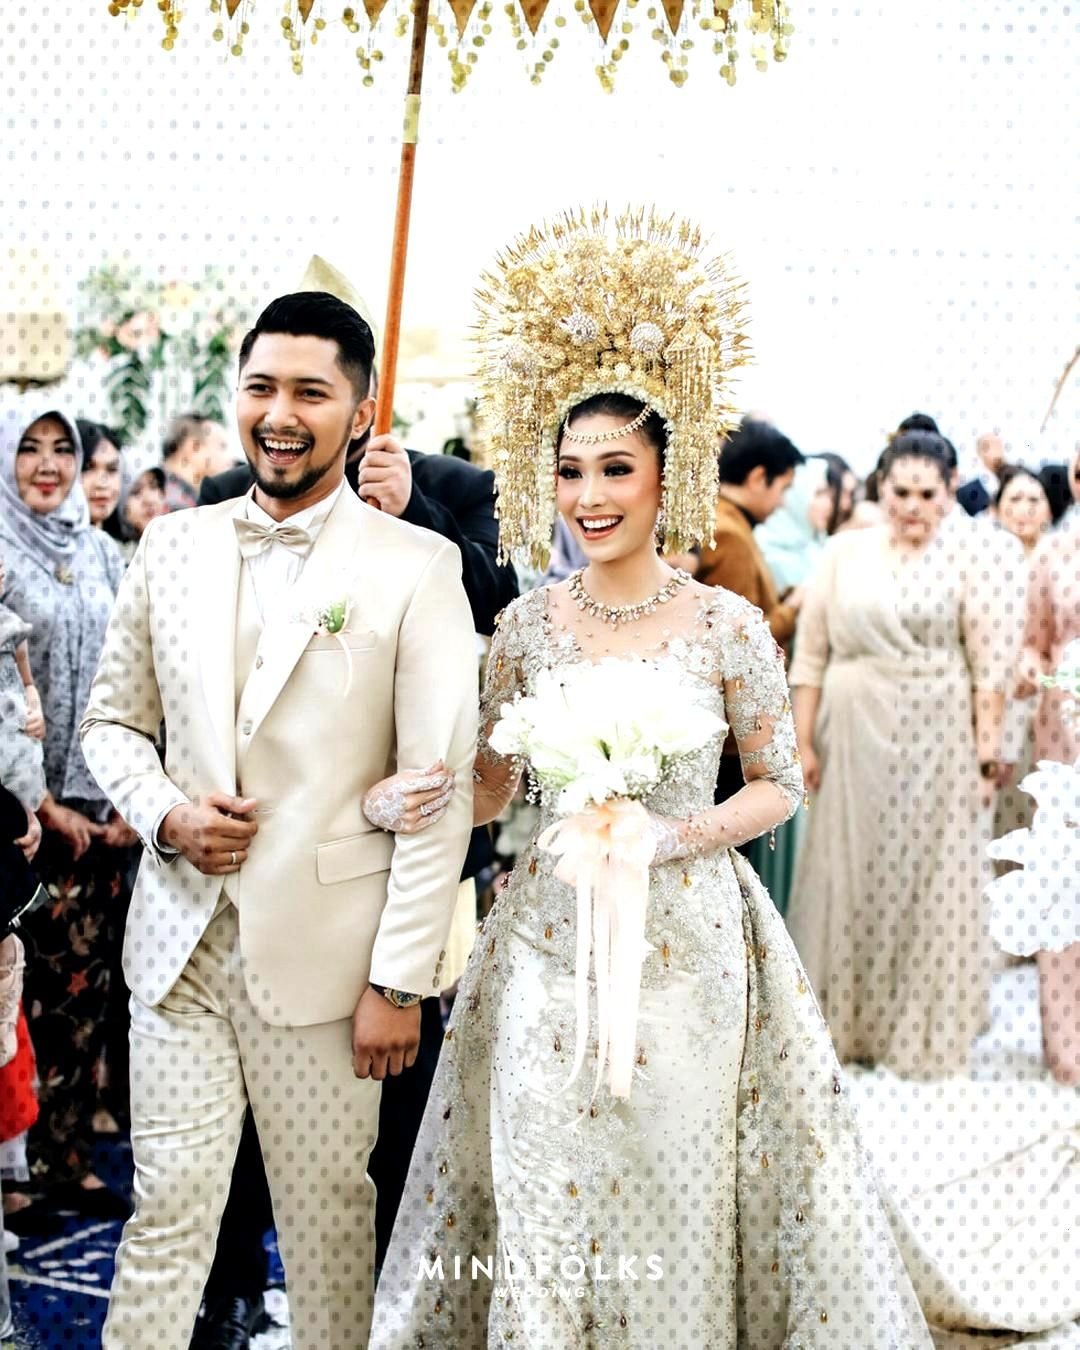 Pernikahan Sentuhan Minang Modern Luthya Adat Yang Kiki Dan Di Sentuhan Adat Minang Yang Modern Di Pernika Indonesian Wedding Wedding Dresses Dresses